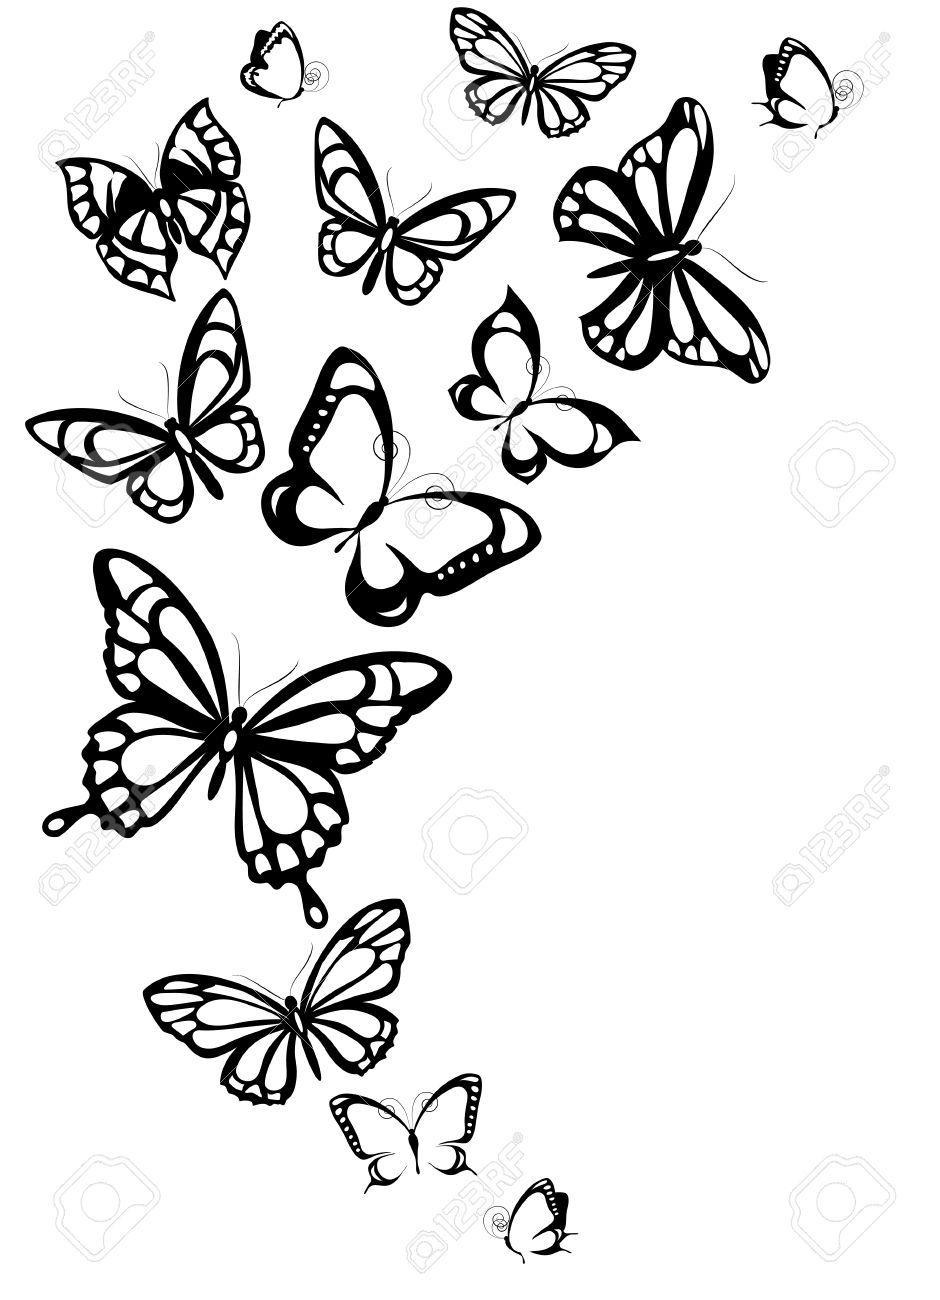 Tatouage Papillon 39 Idees Sur Le Motif Tattoo